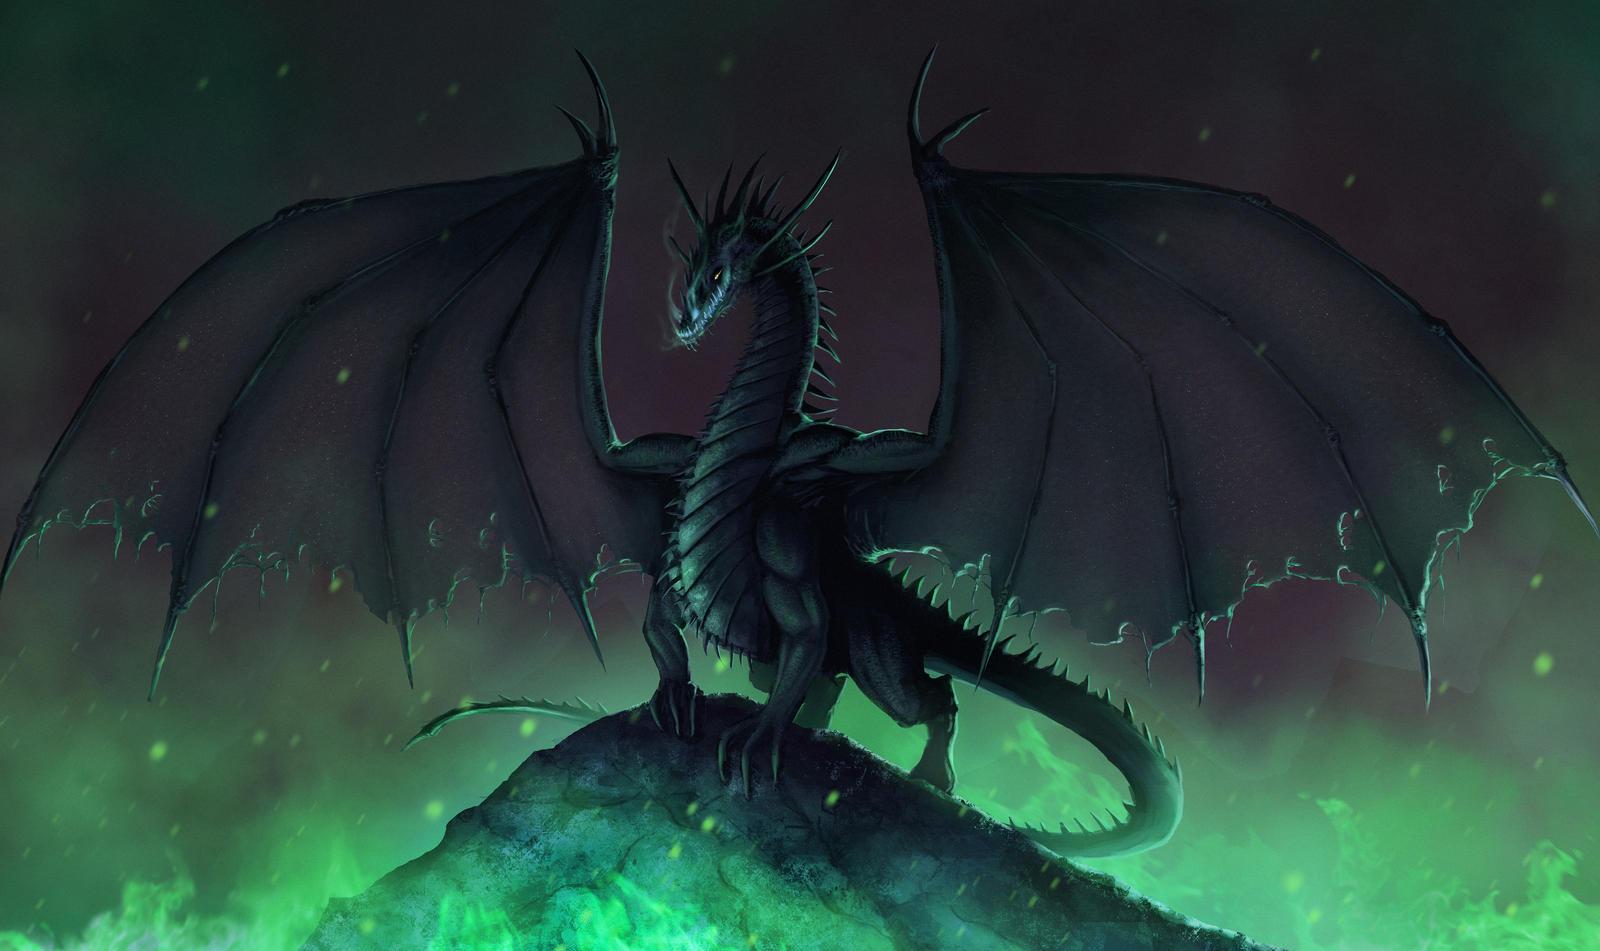 Pin Evil-dragon on Pinterest